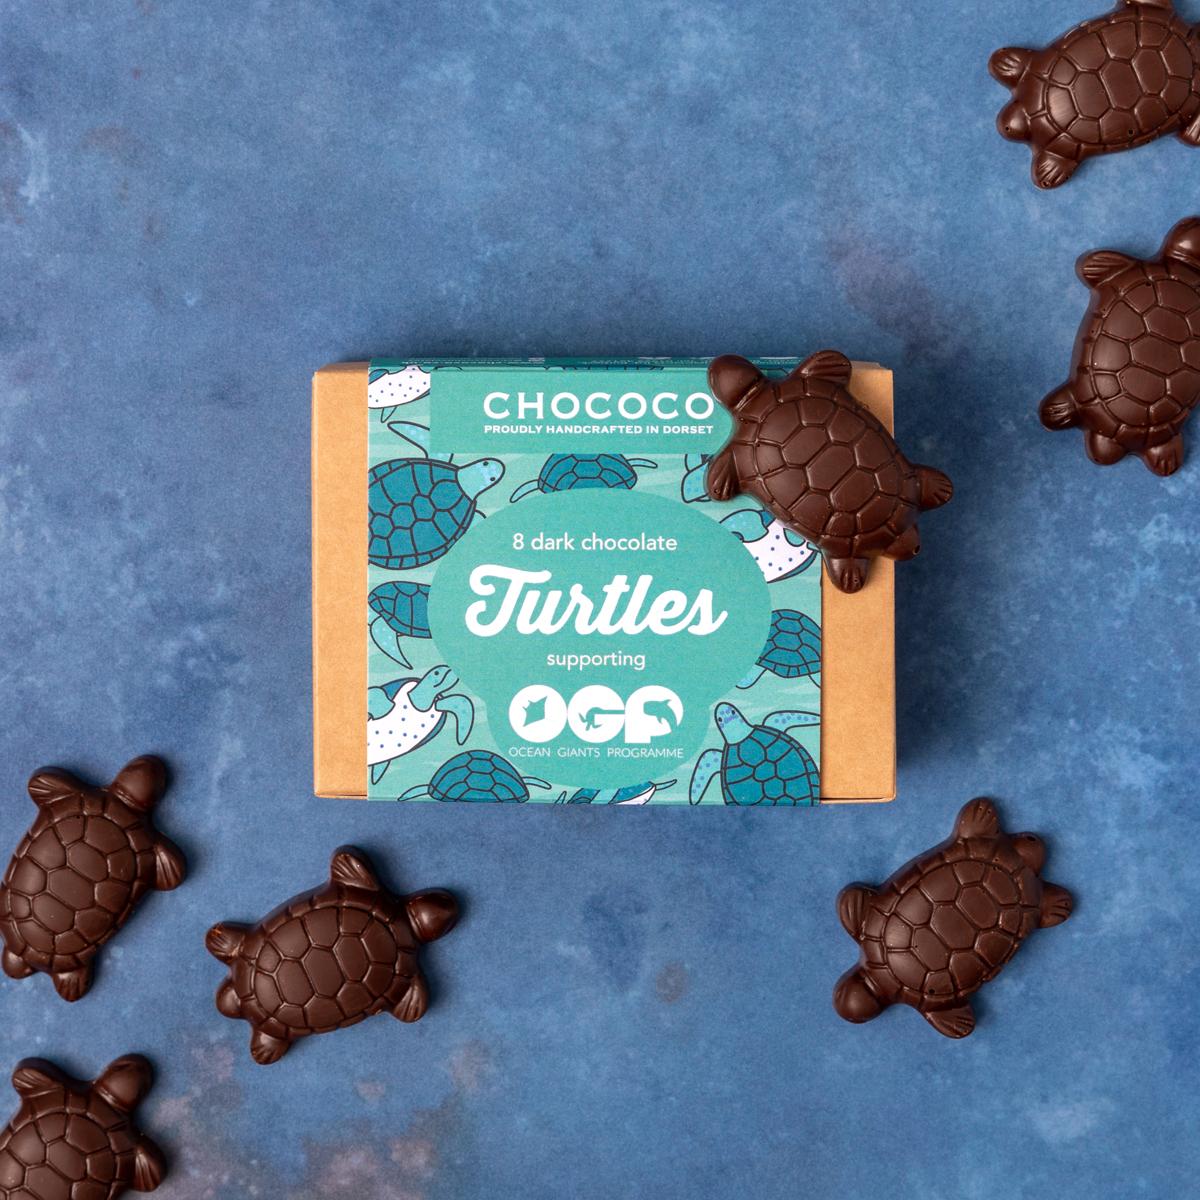 Meet our new Dark Chocolate Turtles!